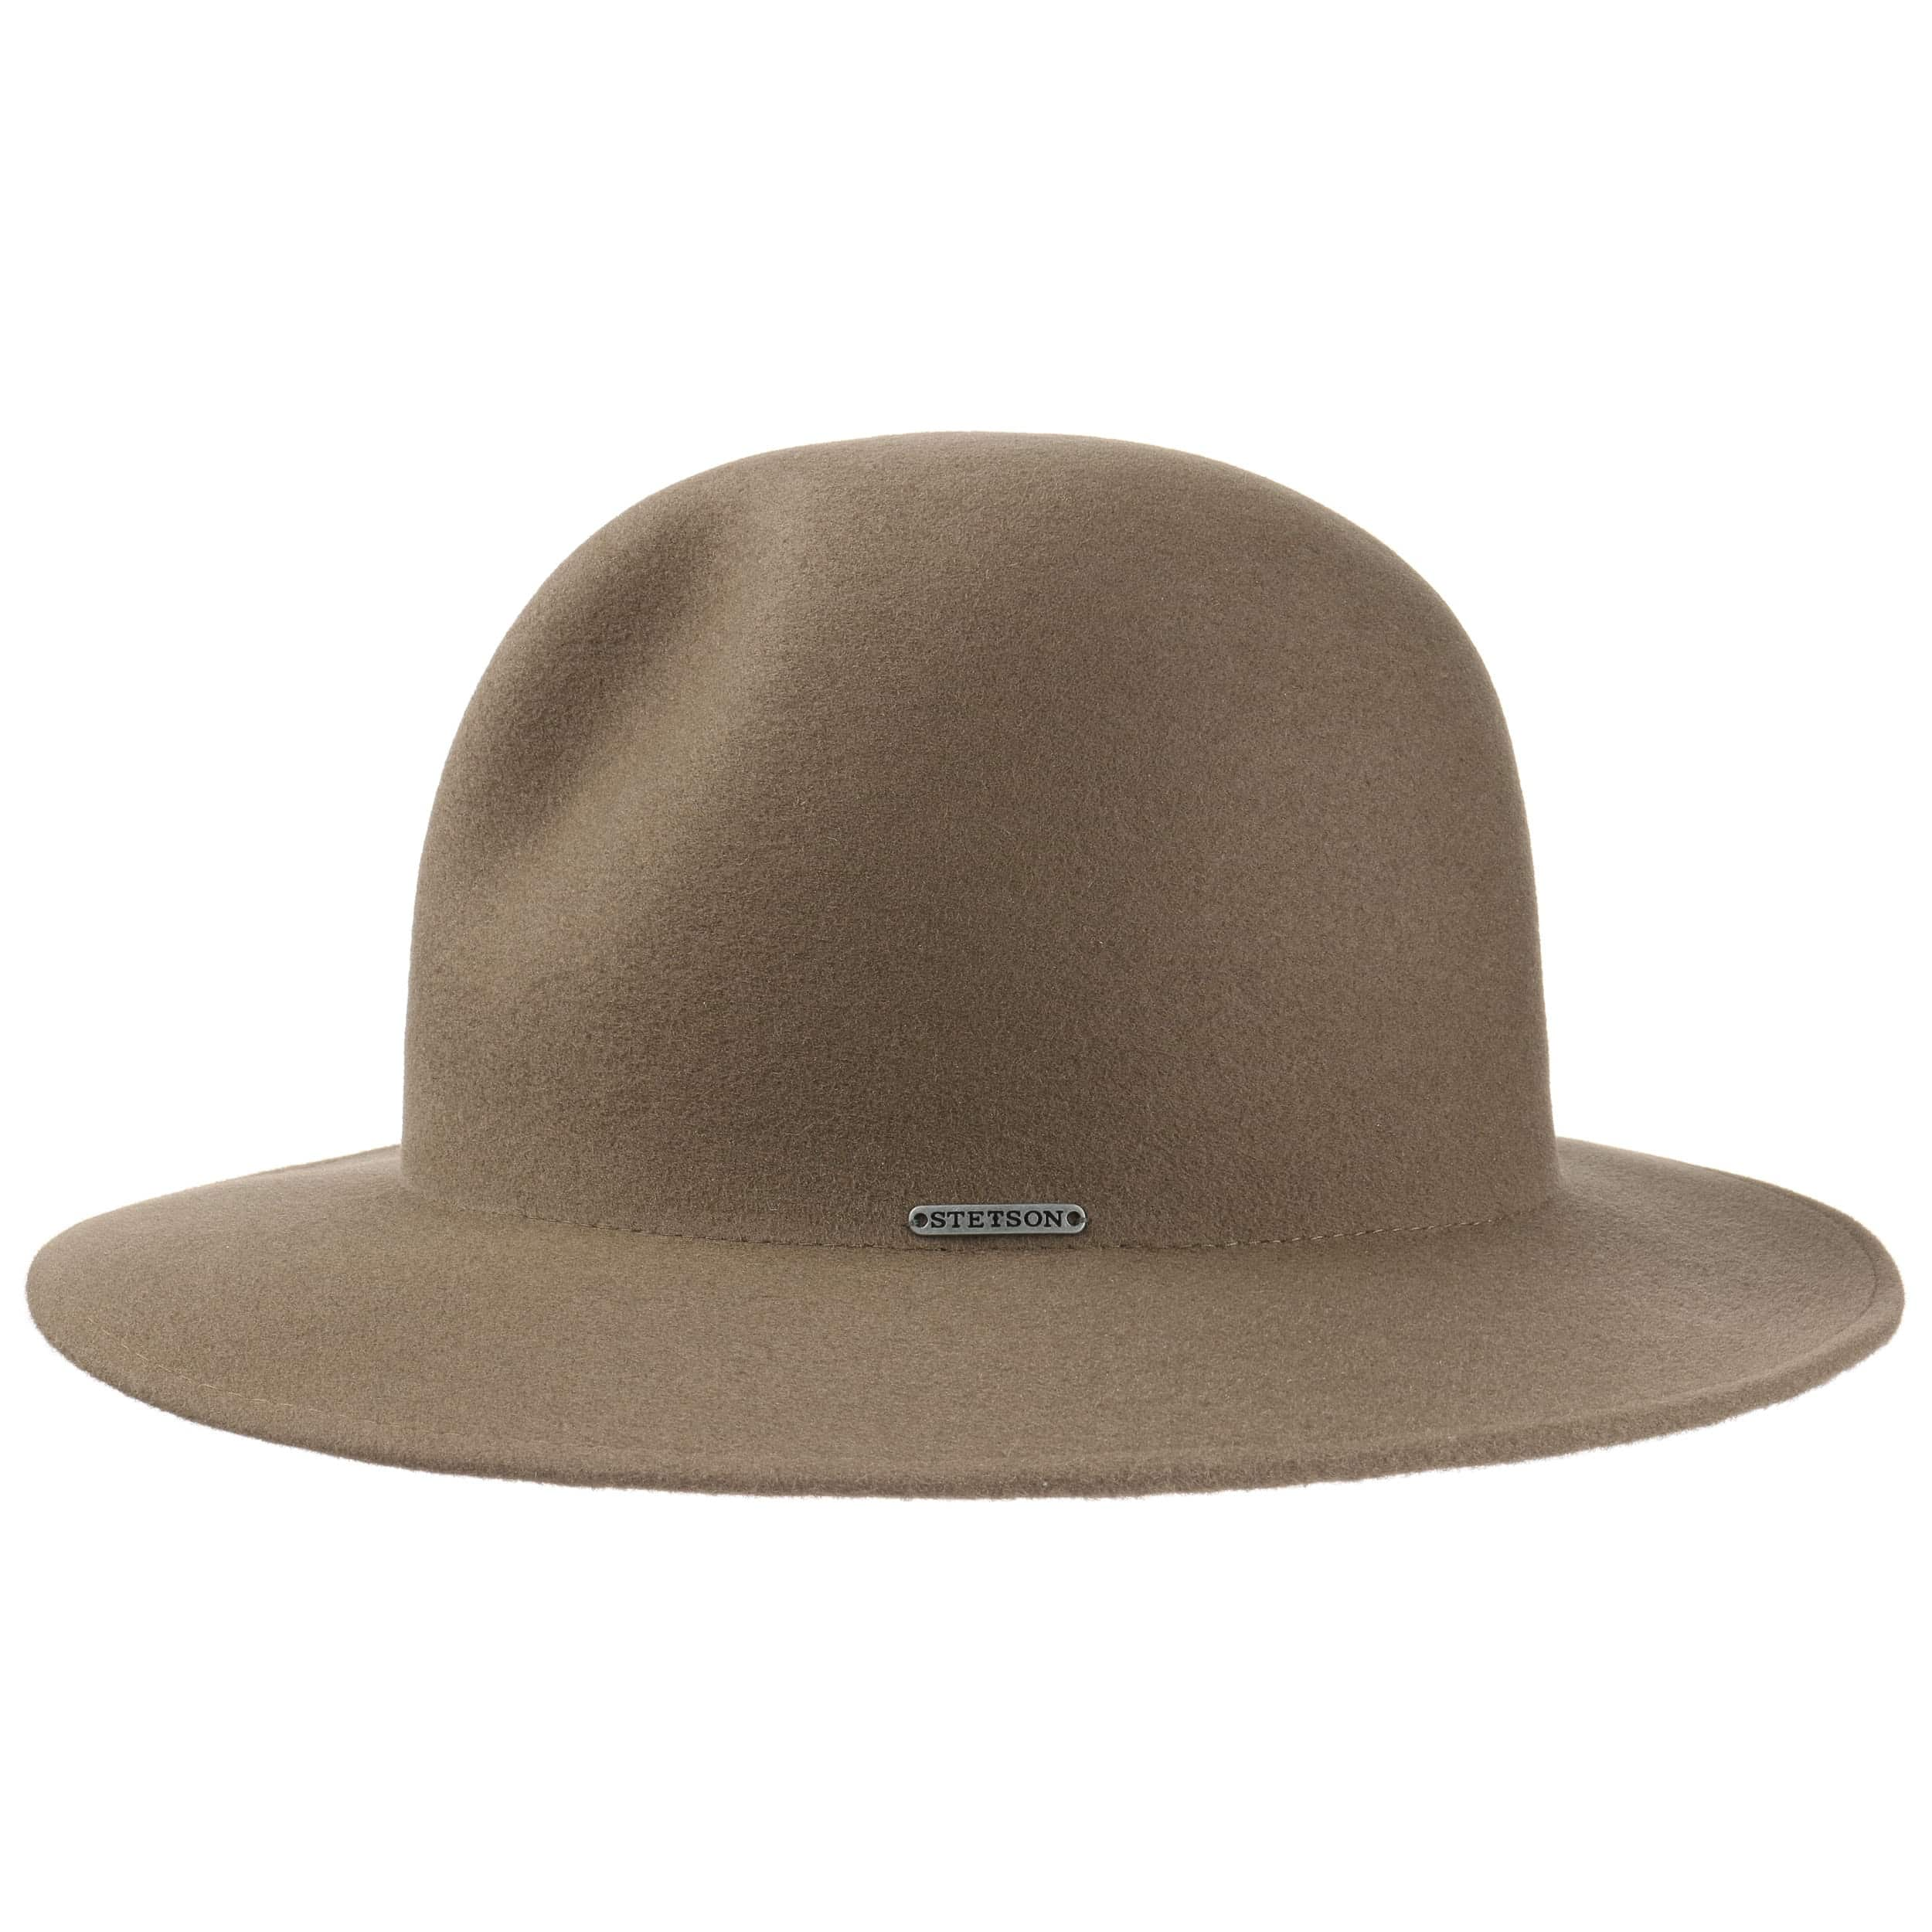 Sombrero Tuscalo Woolfelt by Stetson - Sombreros - sombreroshop.es 54c5eb5e26f